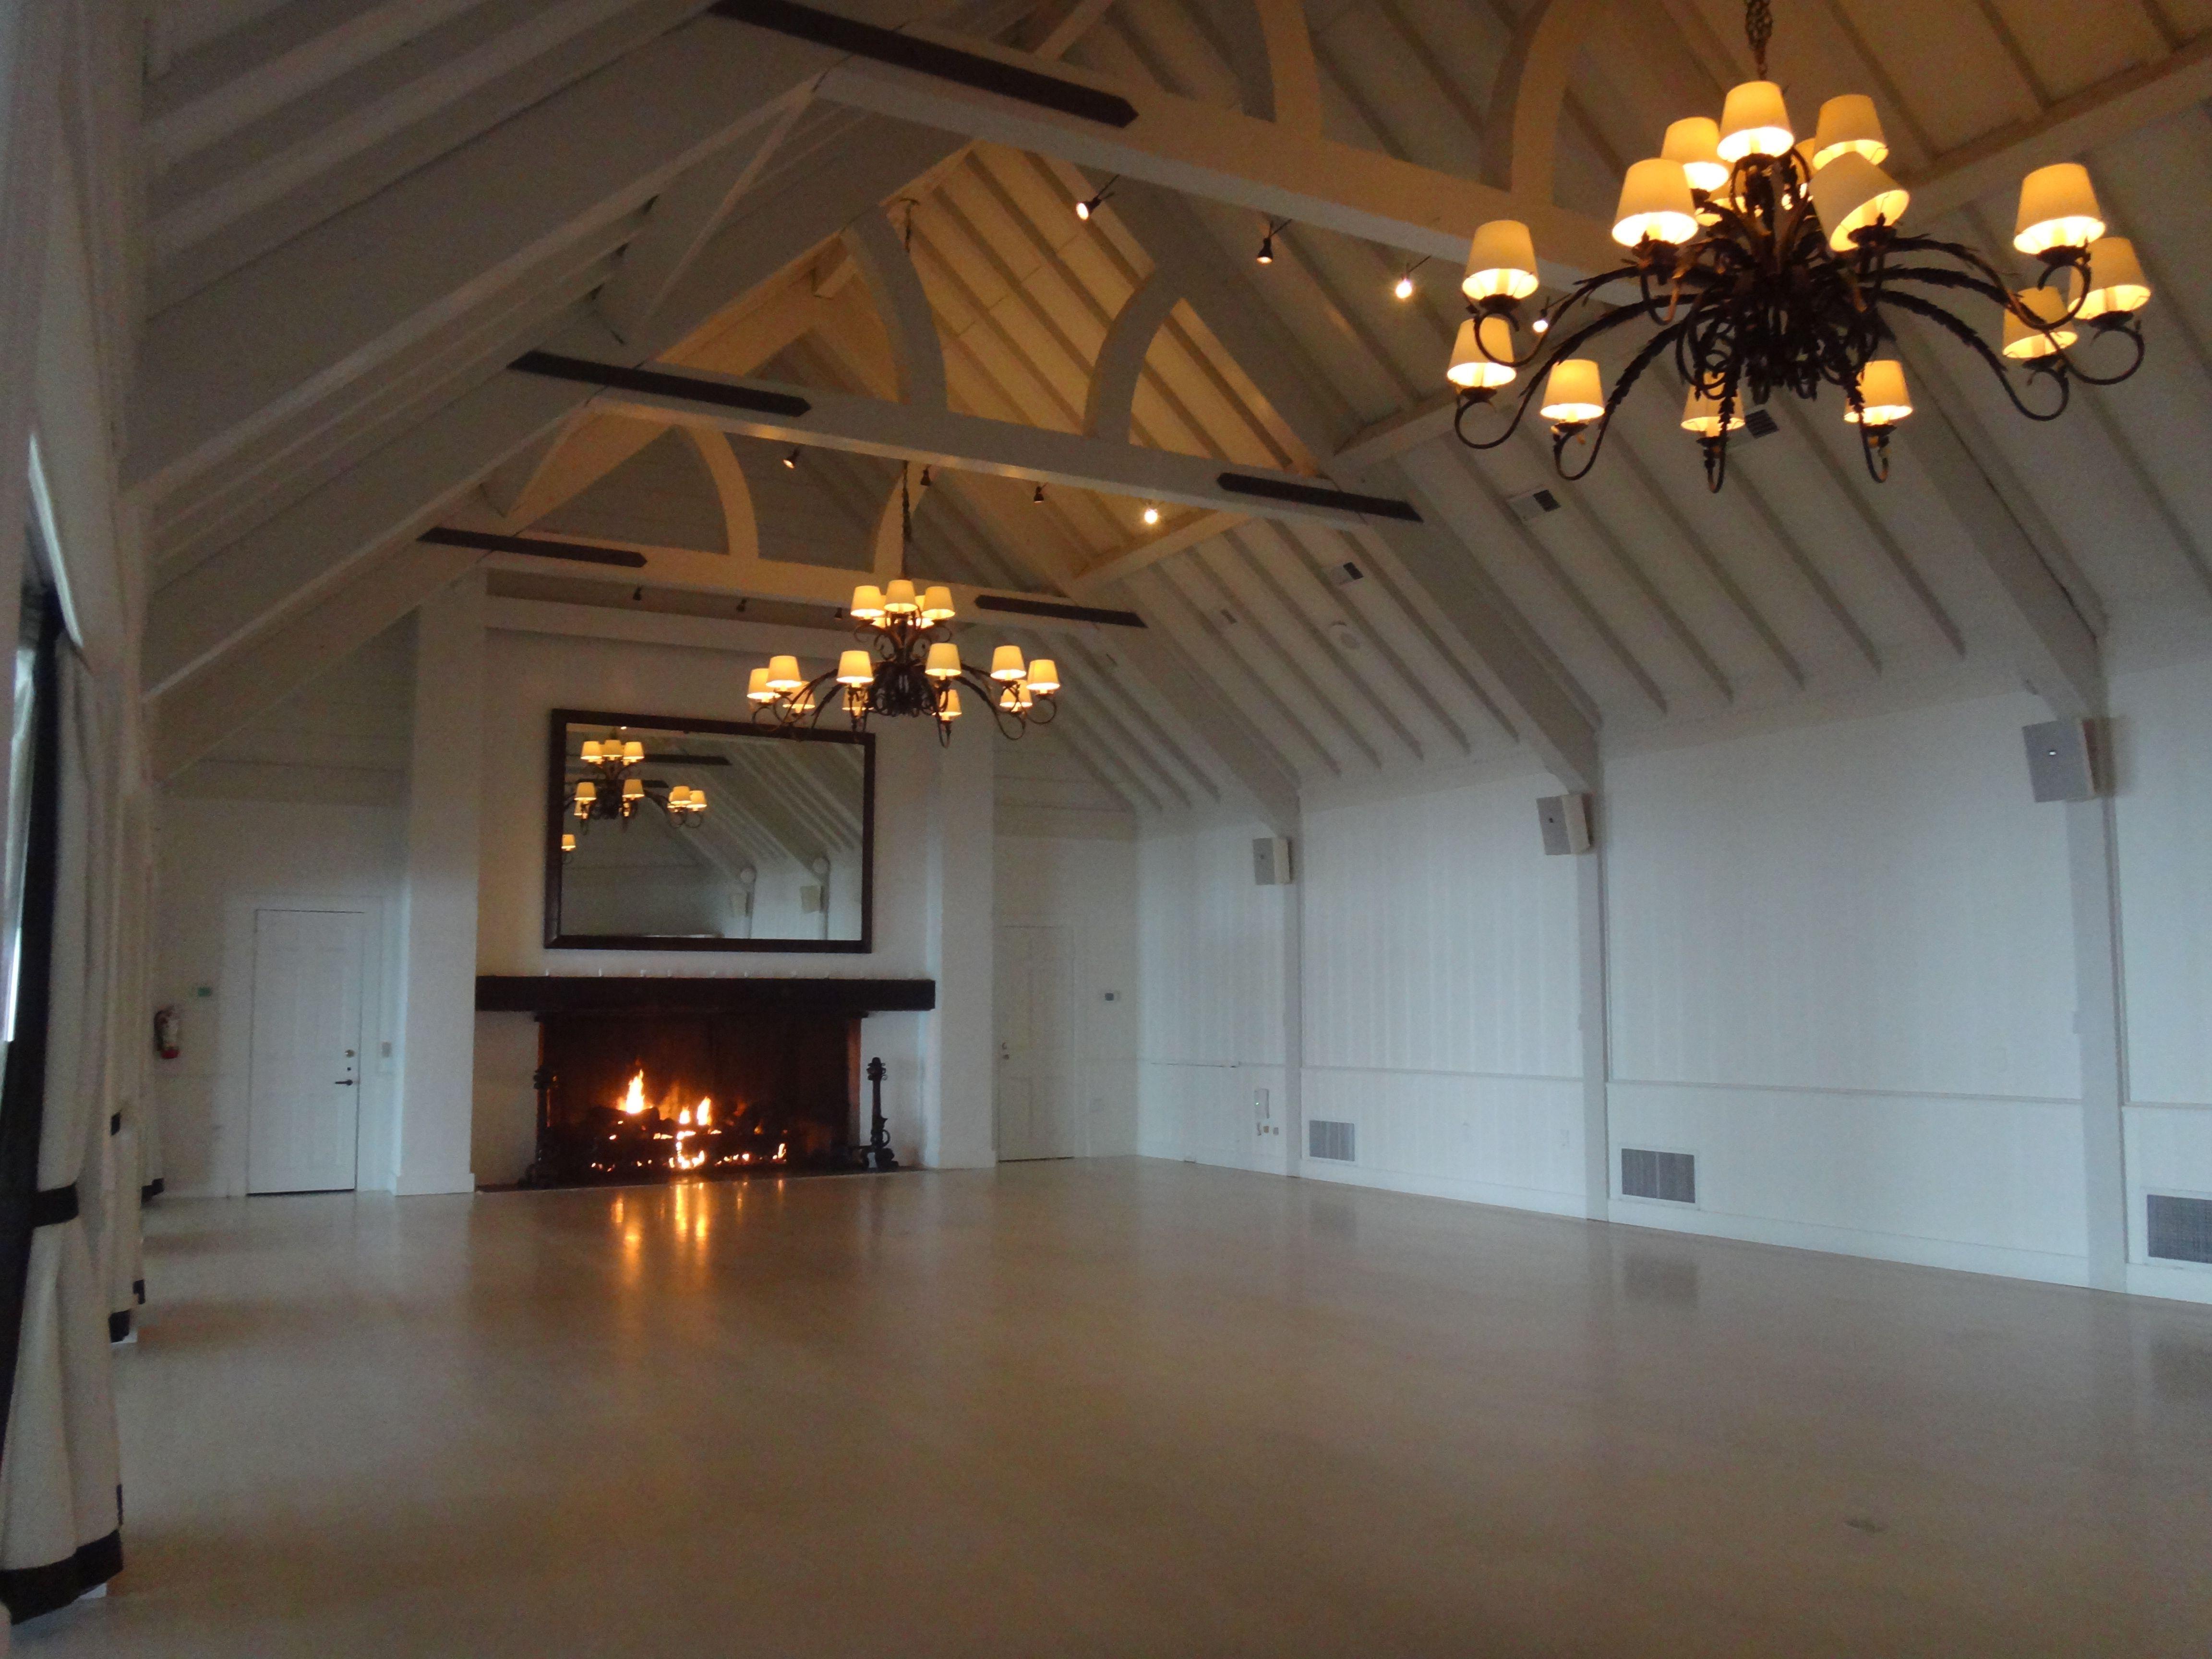 Farmhouse Ballroom At The Montauk Yacht Club Gorgeous Blank Slate To Create Wedding You Envision